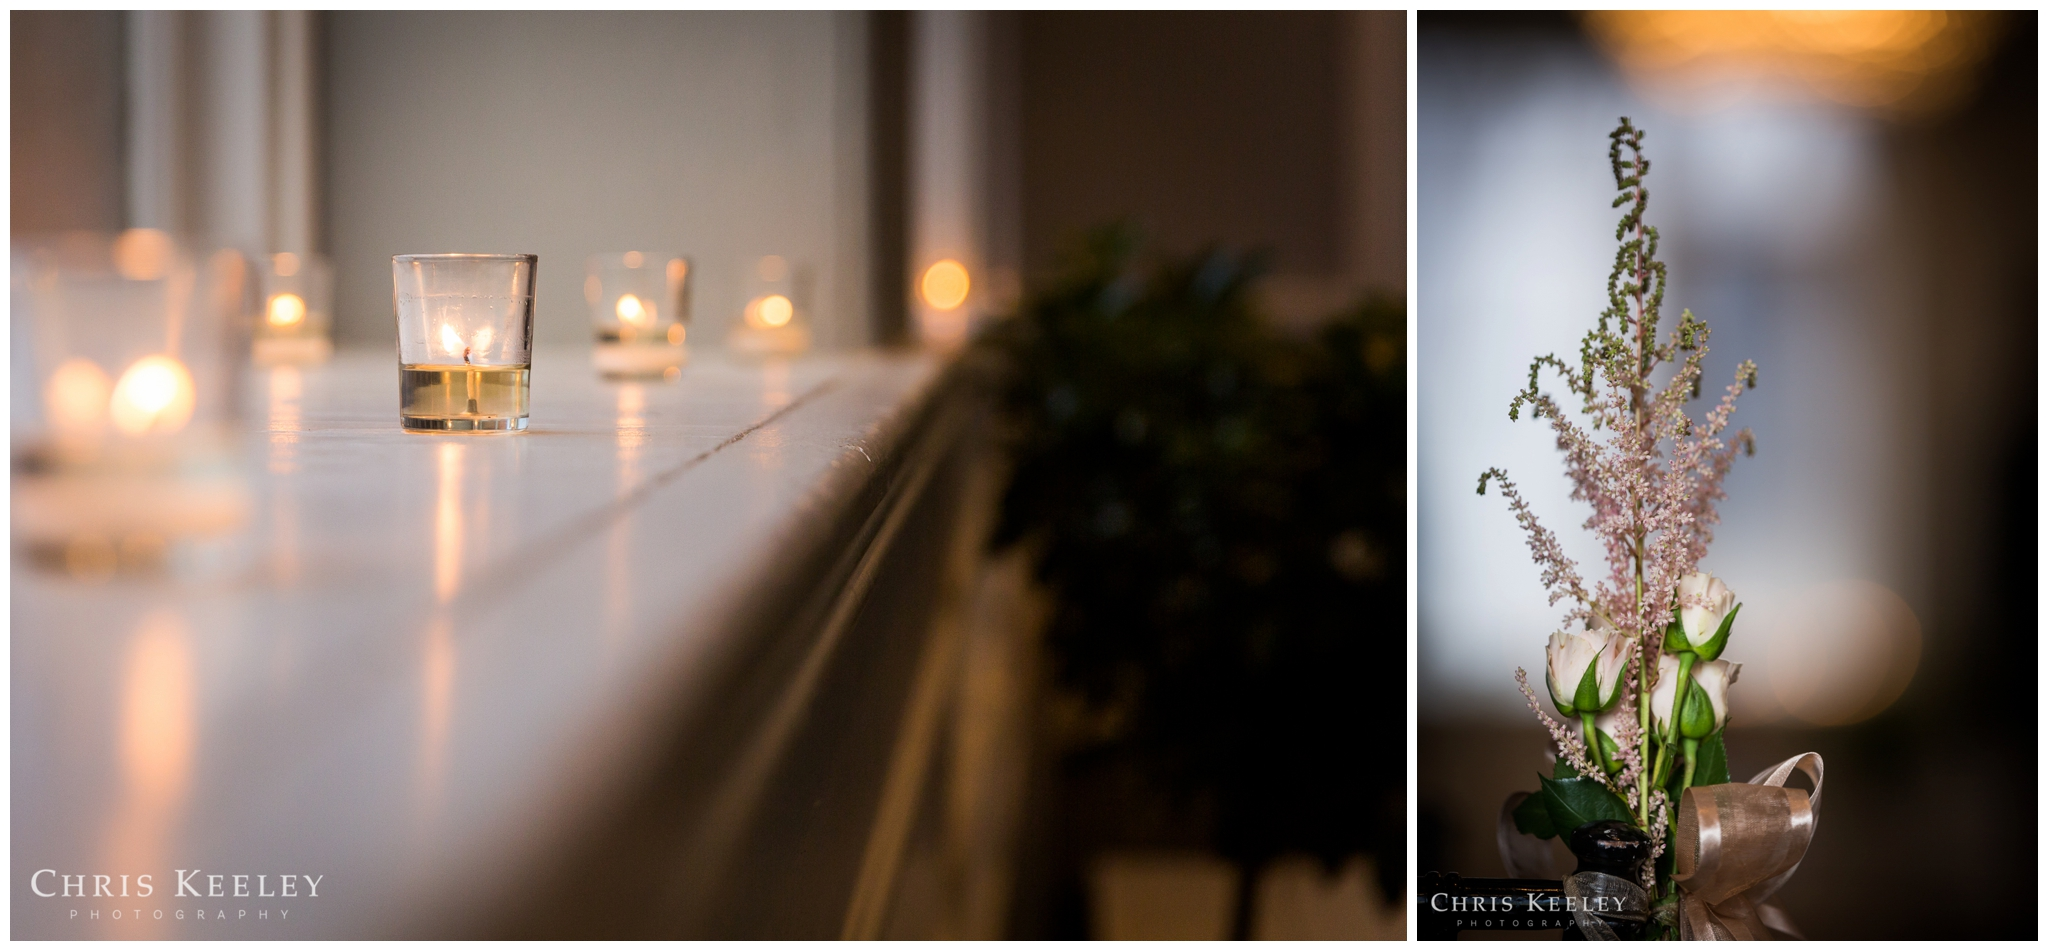 grace-restaurant-portland-maine-wedding-photographer-chris-keeley-34.jpg